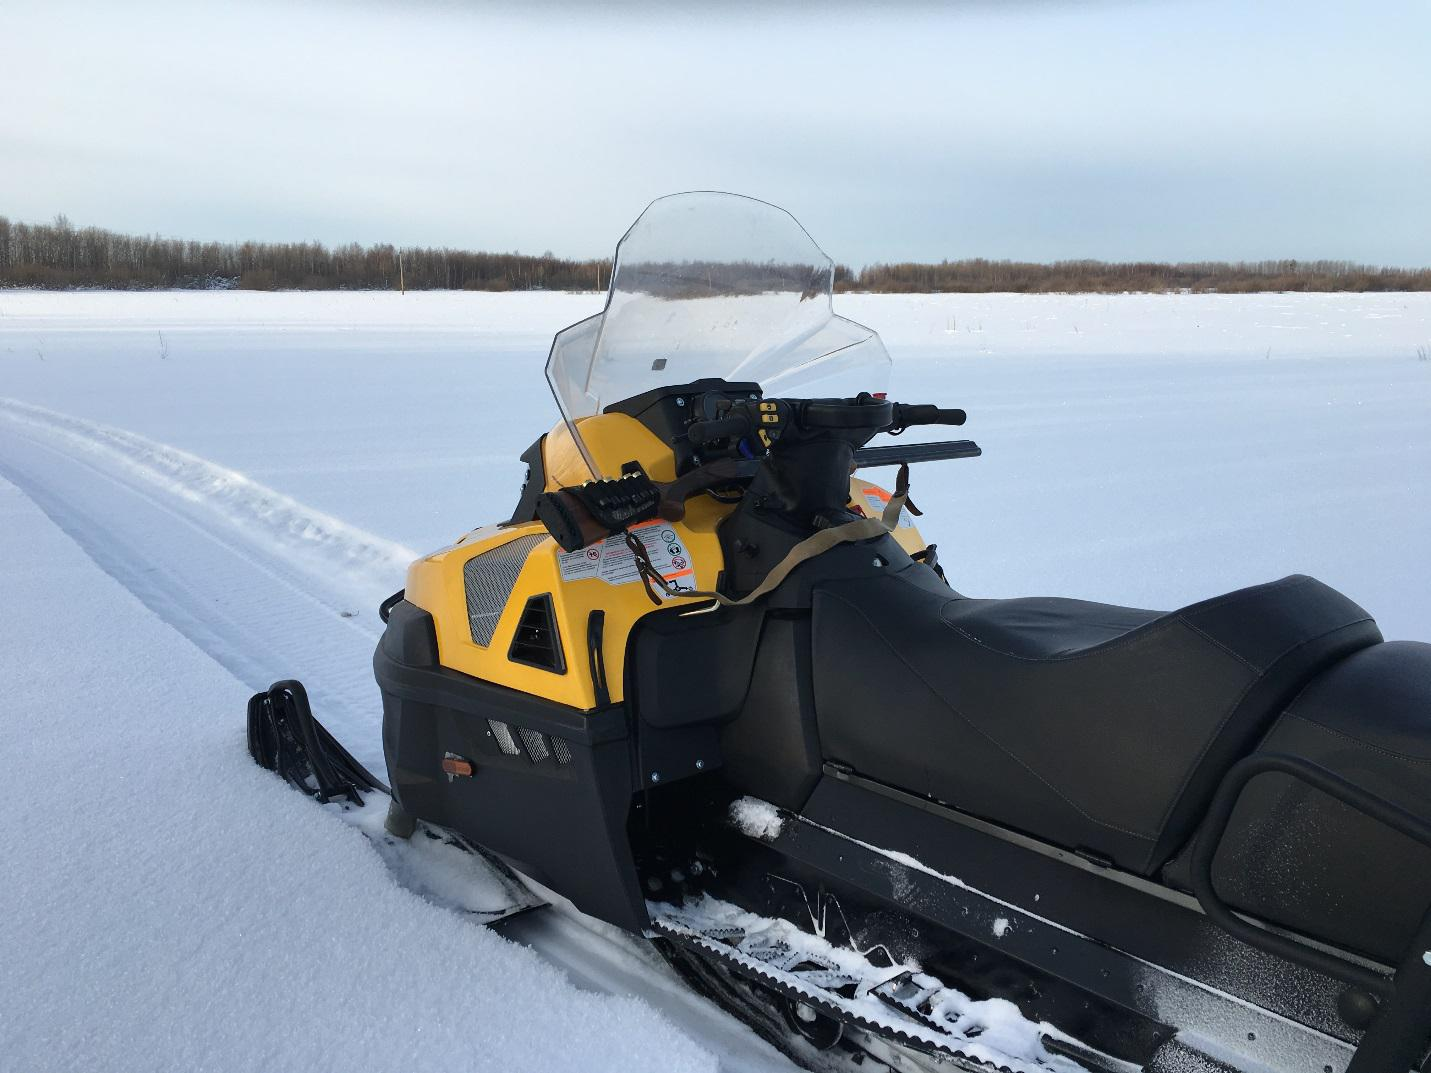 Запчасти для снегоходов Стелс Викинг